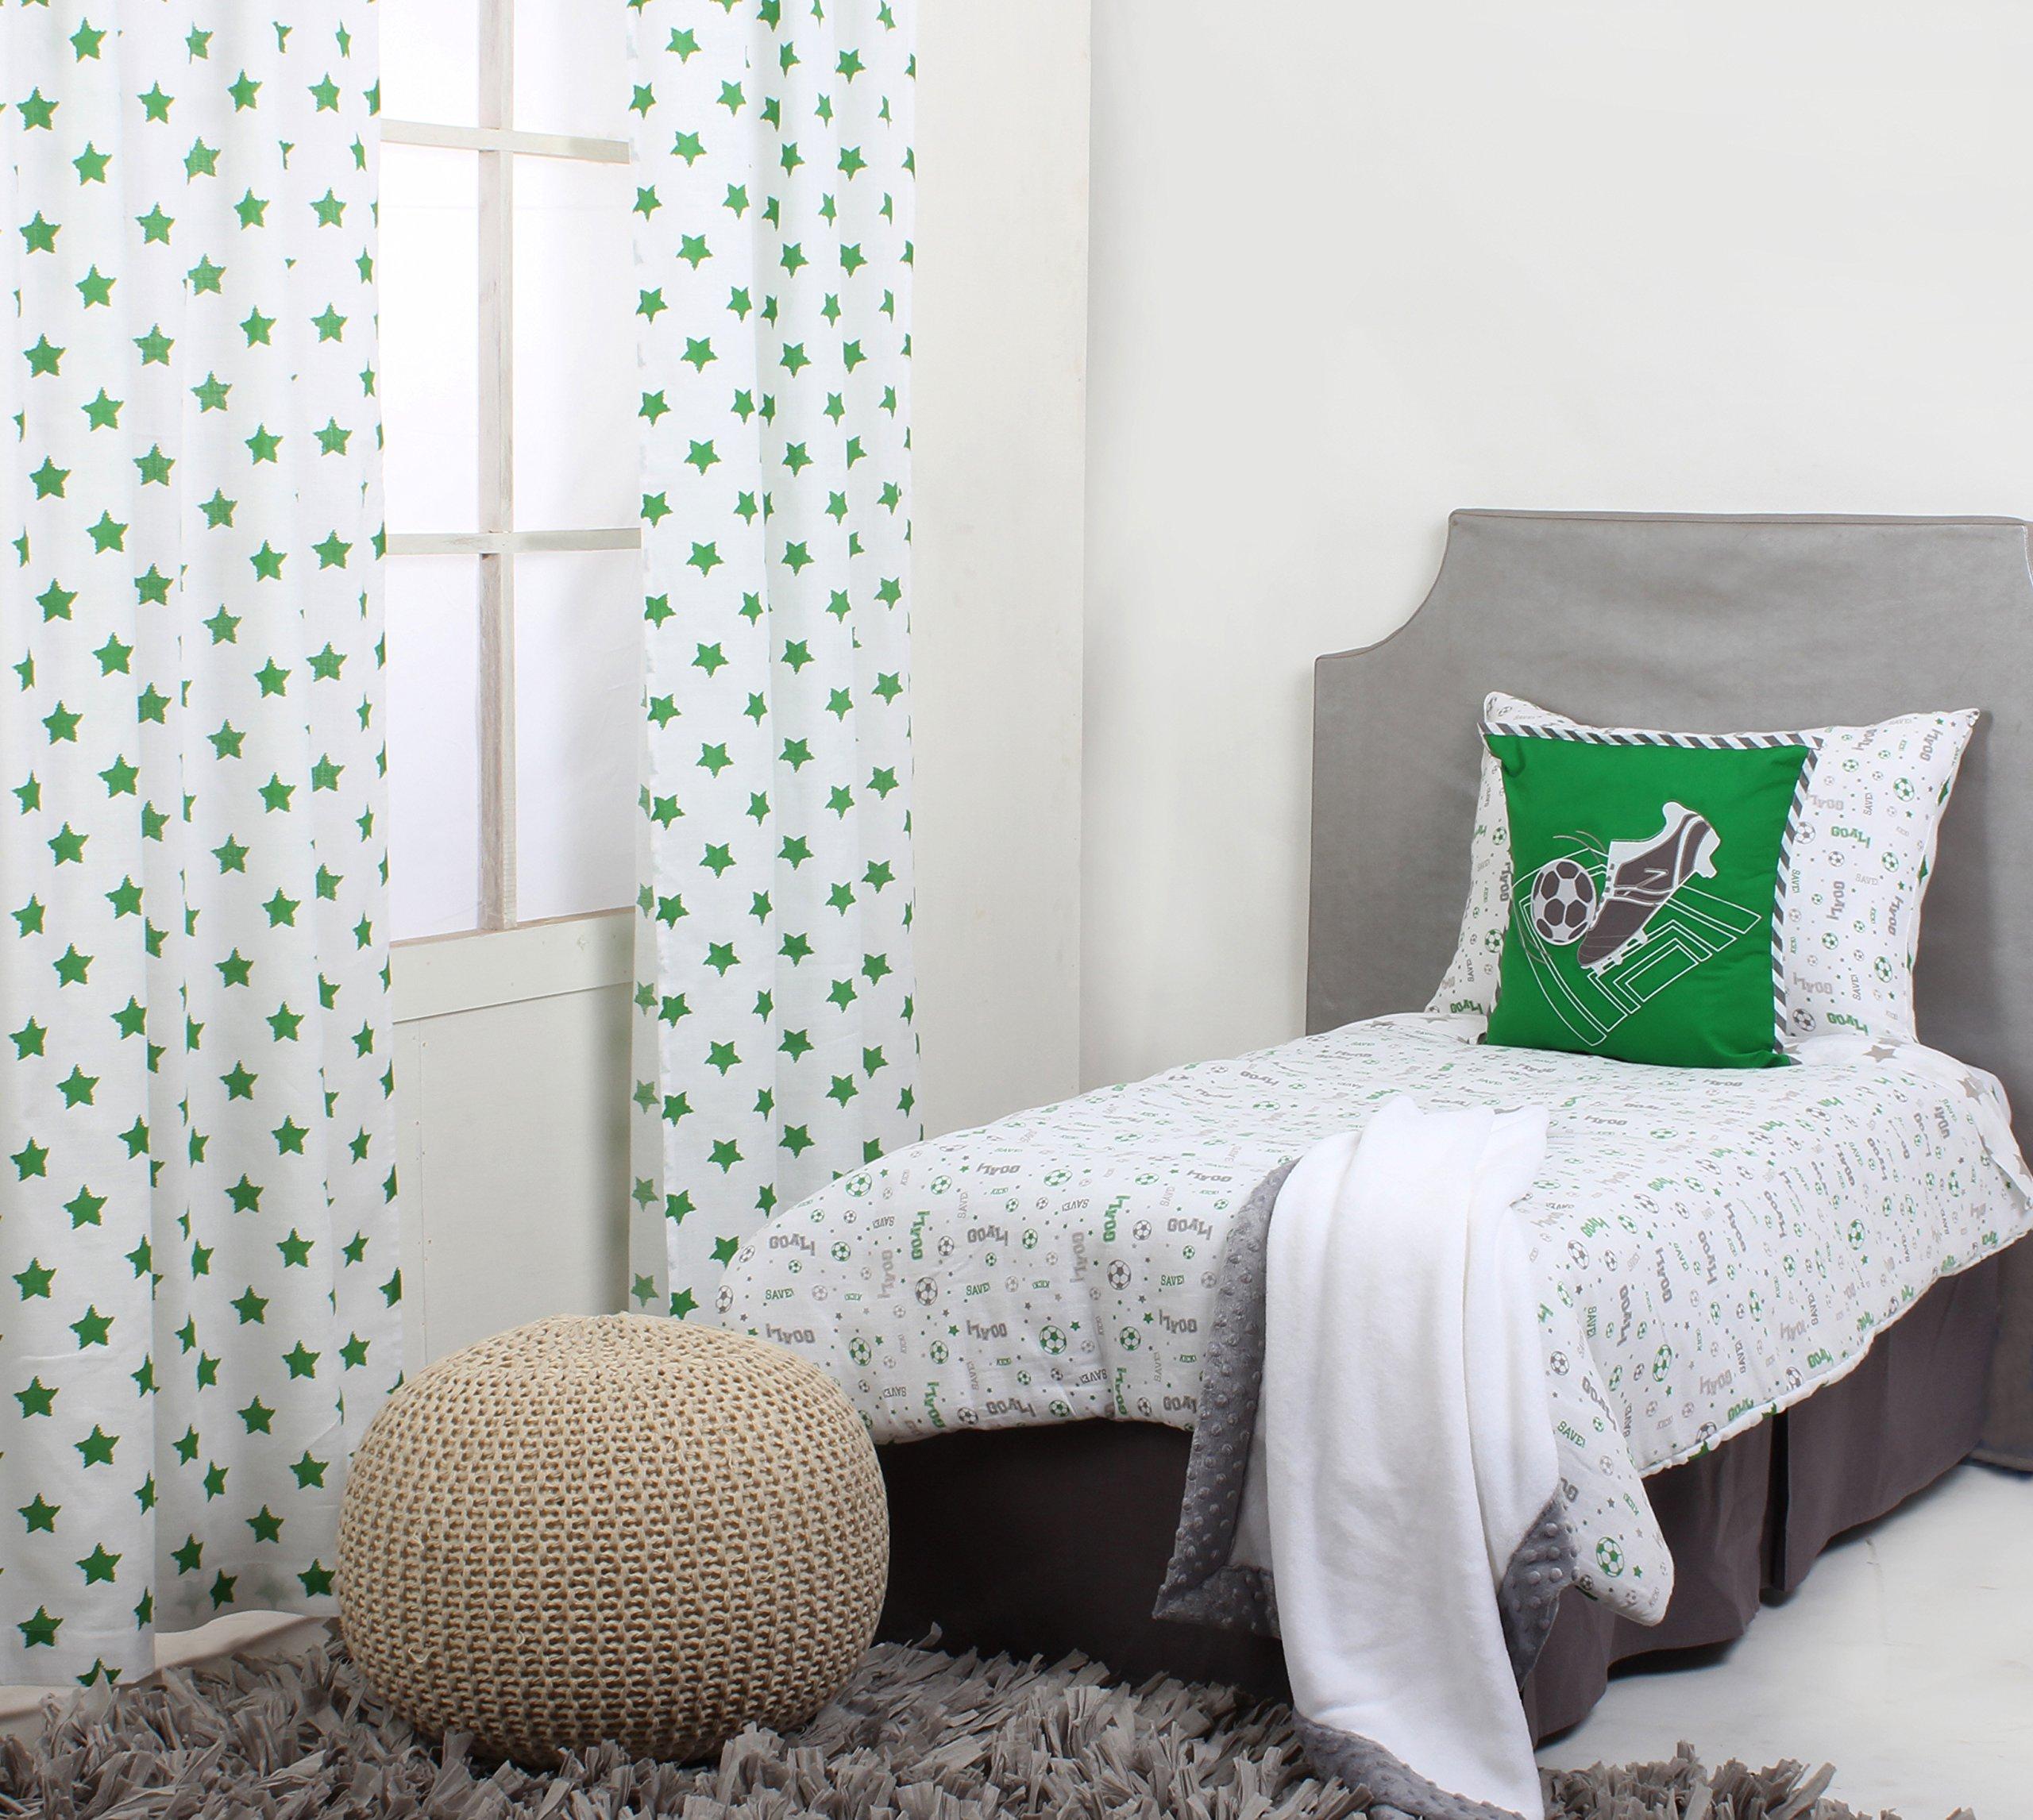 Bacati Soccer Muslin 4 Piece Toddler Bedding Set, Green/Grey